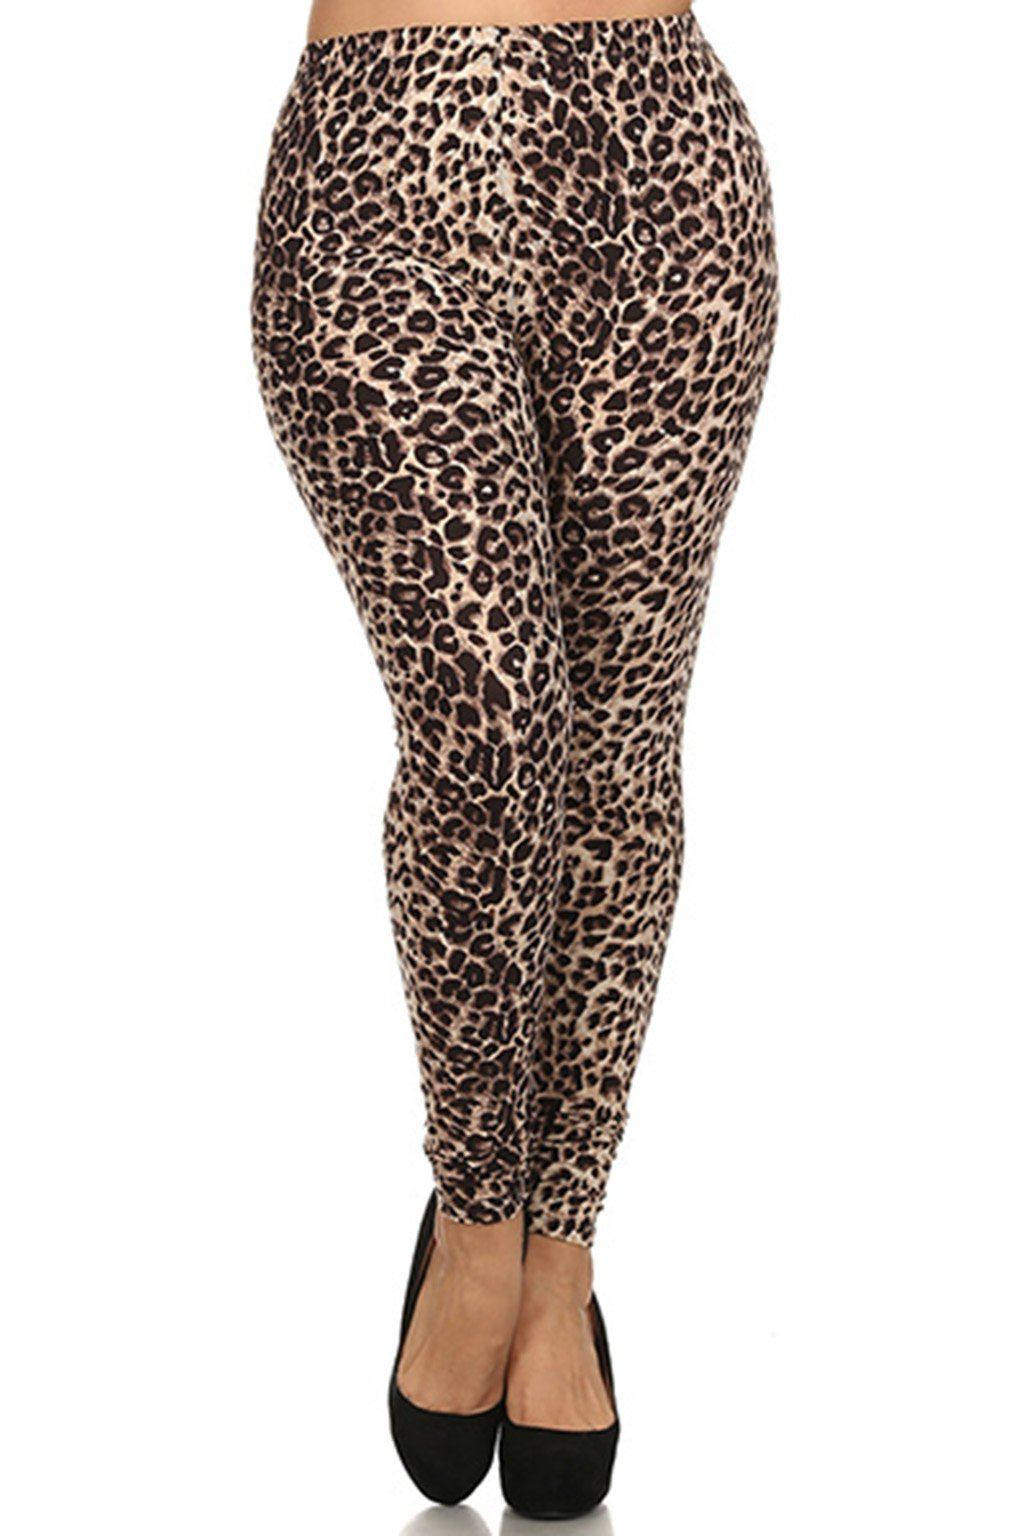 ALWAYS Women's Junior Plus Size Stretch Brown Leopard Print Leggings